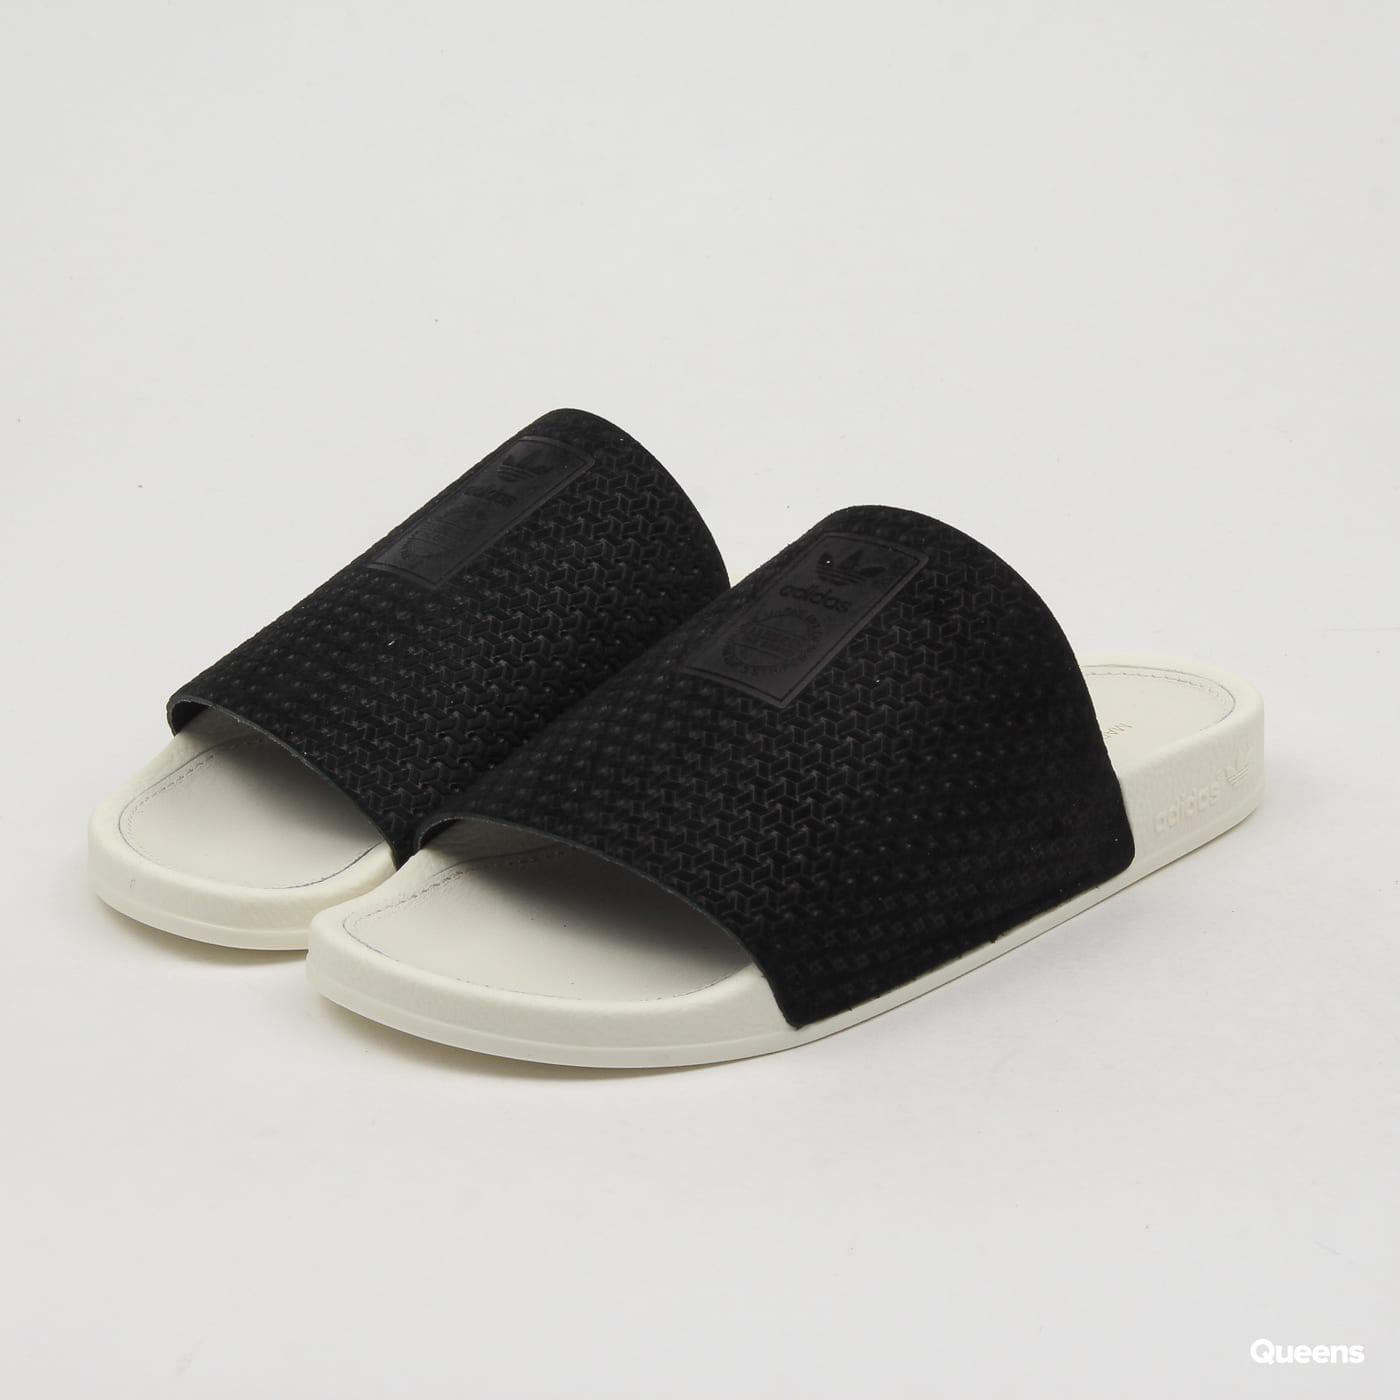 new style ce719 ff50e adidas Originals Adilette Luxe W (CG6554)– Queens 💚